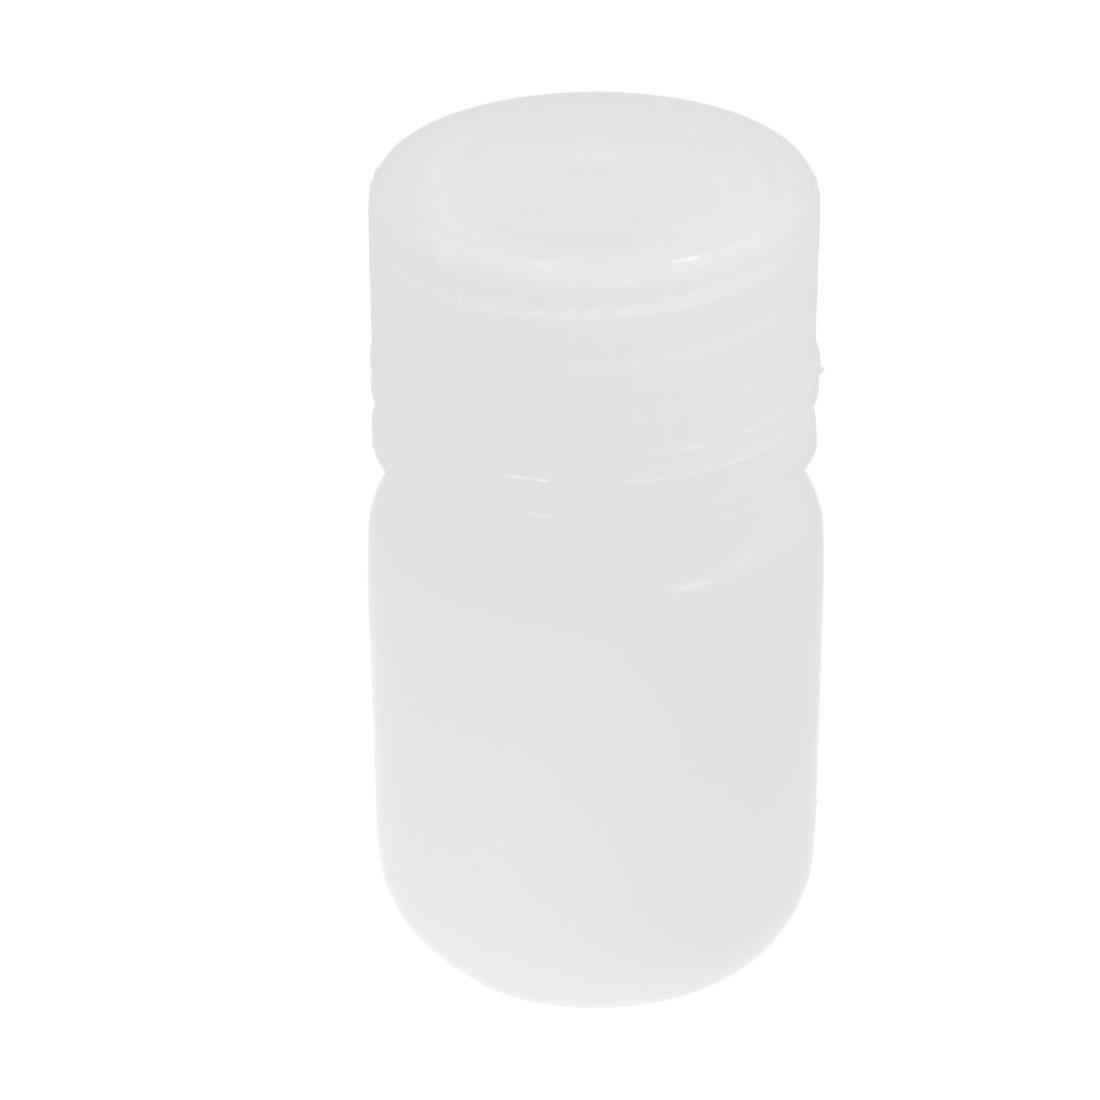 Plastic Screw Lid 30mL Chemicals Storage Container White Plastic Reagent Bottle 1 oz